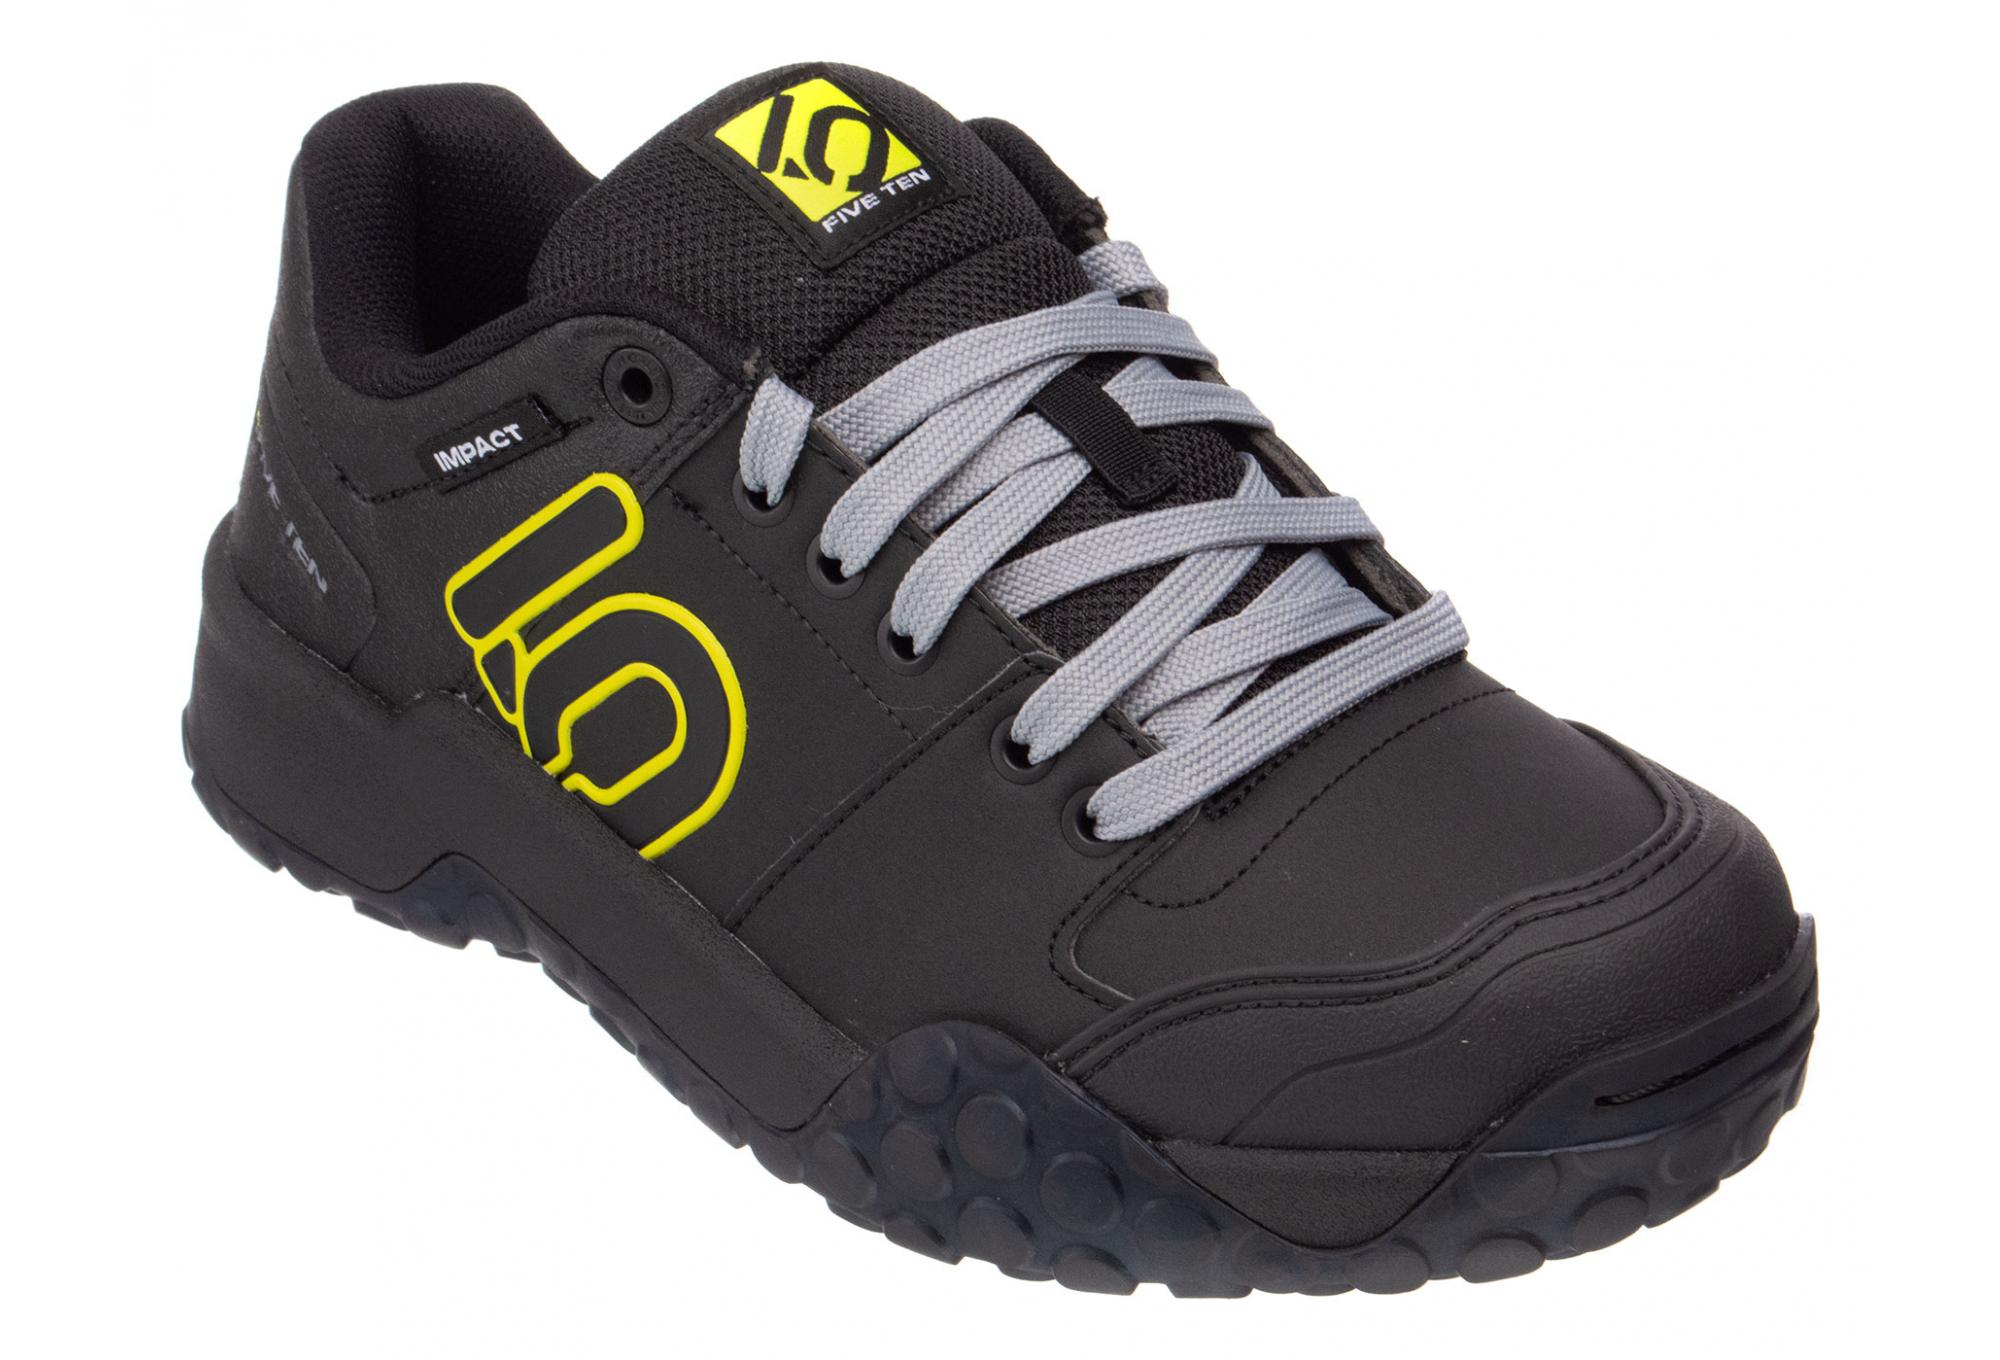 en venta auténtico mejor sitio web Fiveten Impact Sam Hill Shoes Black